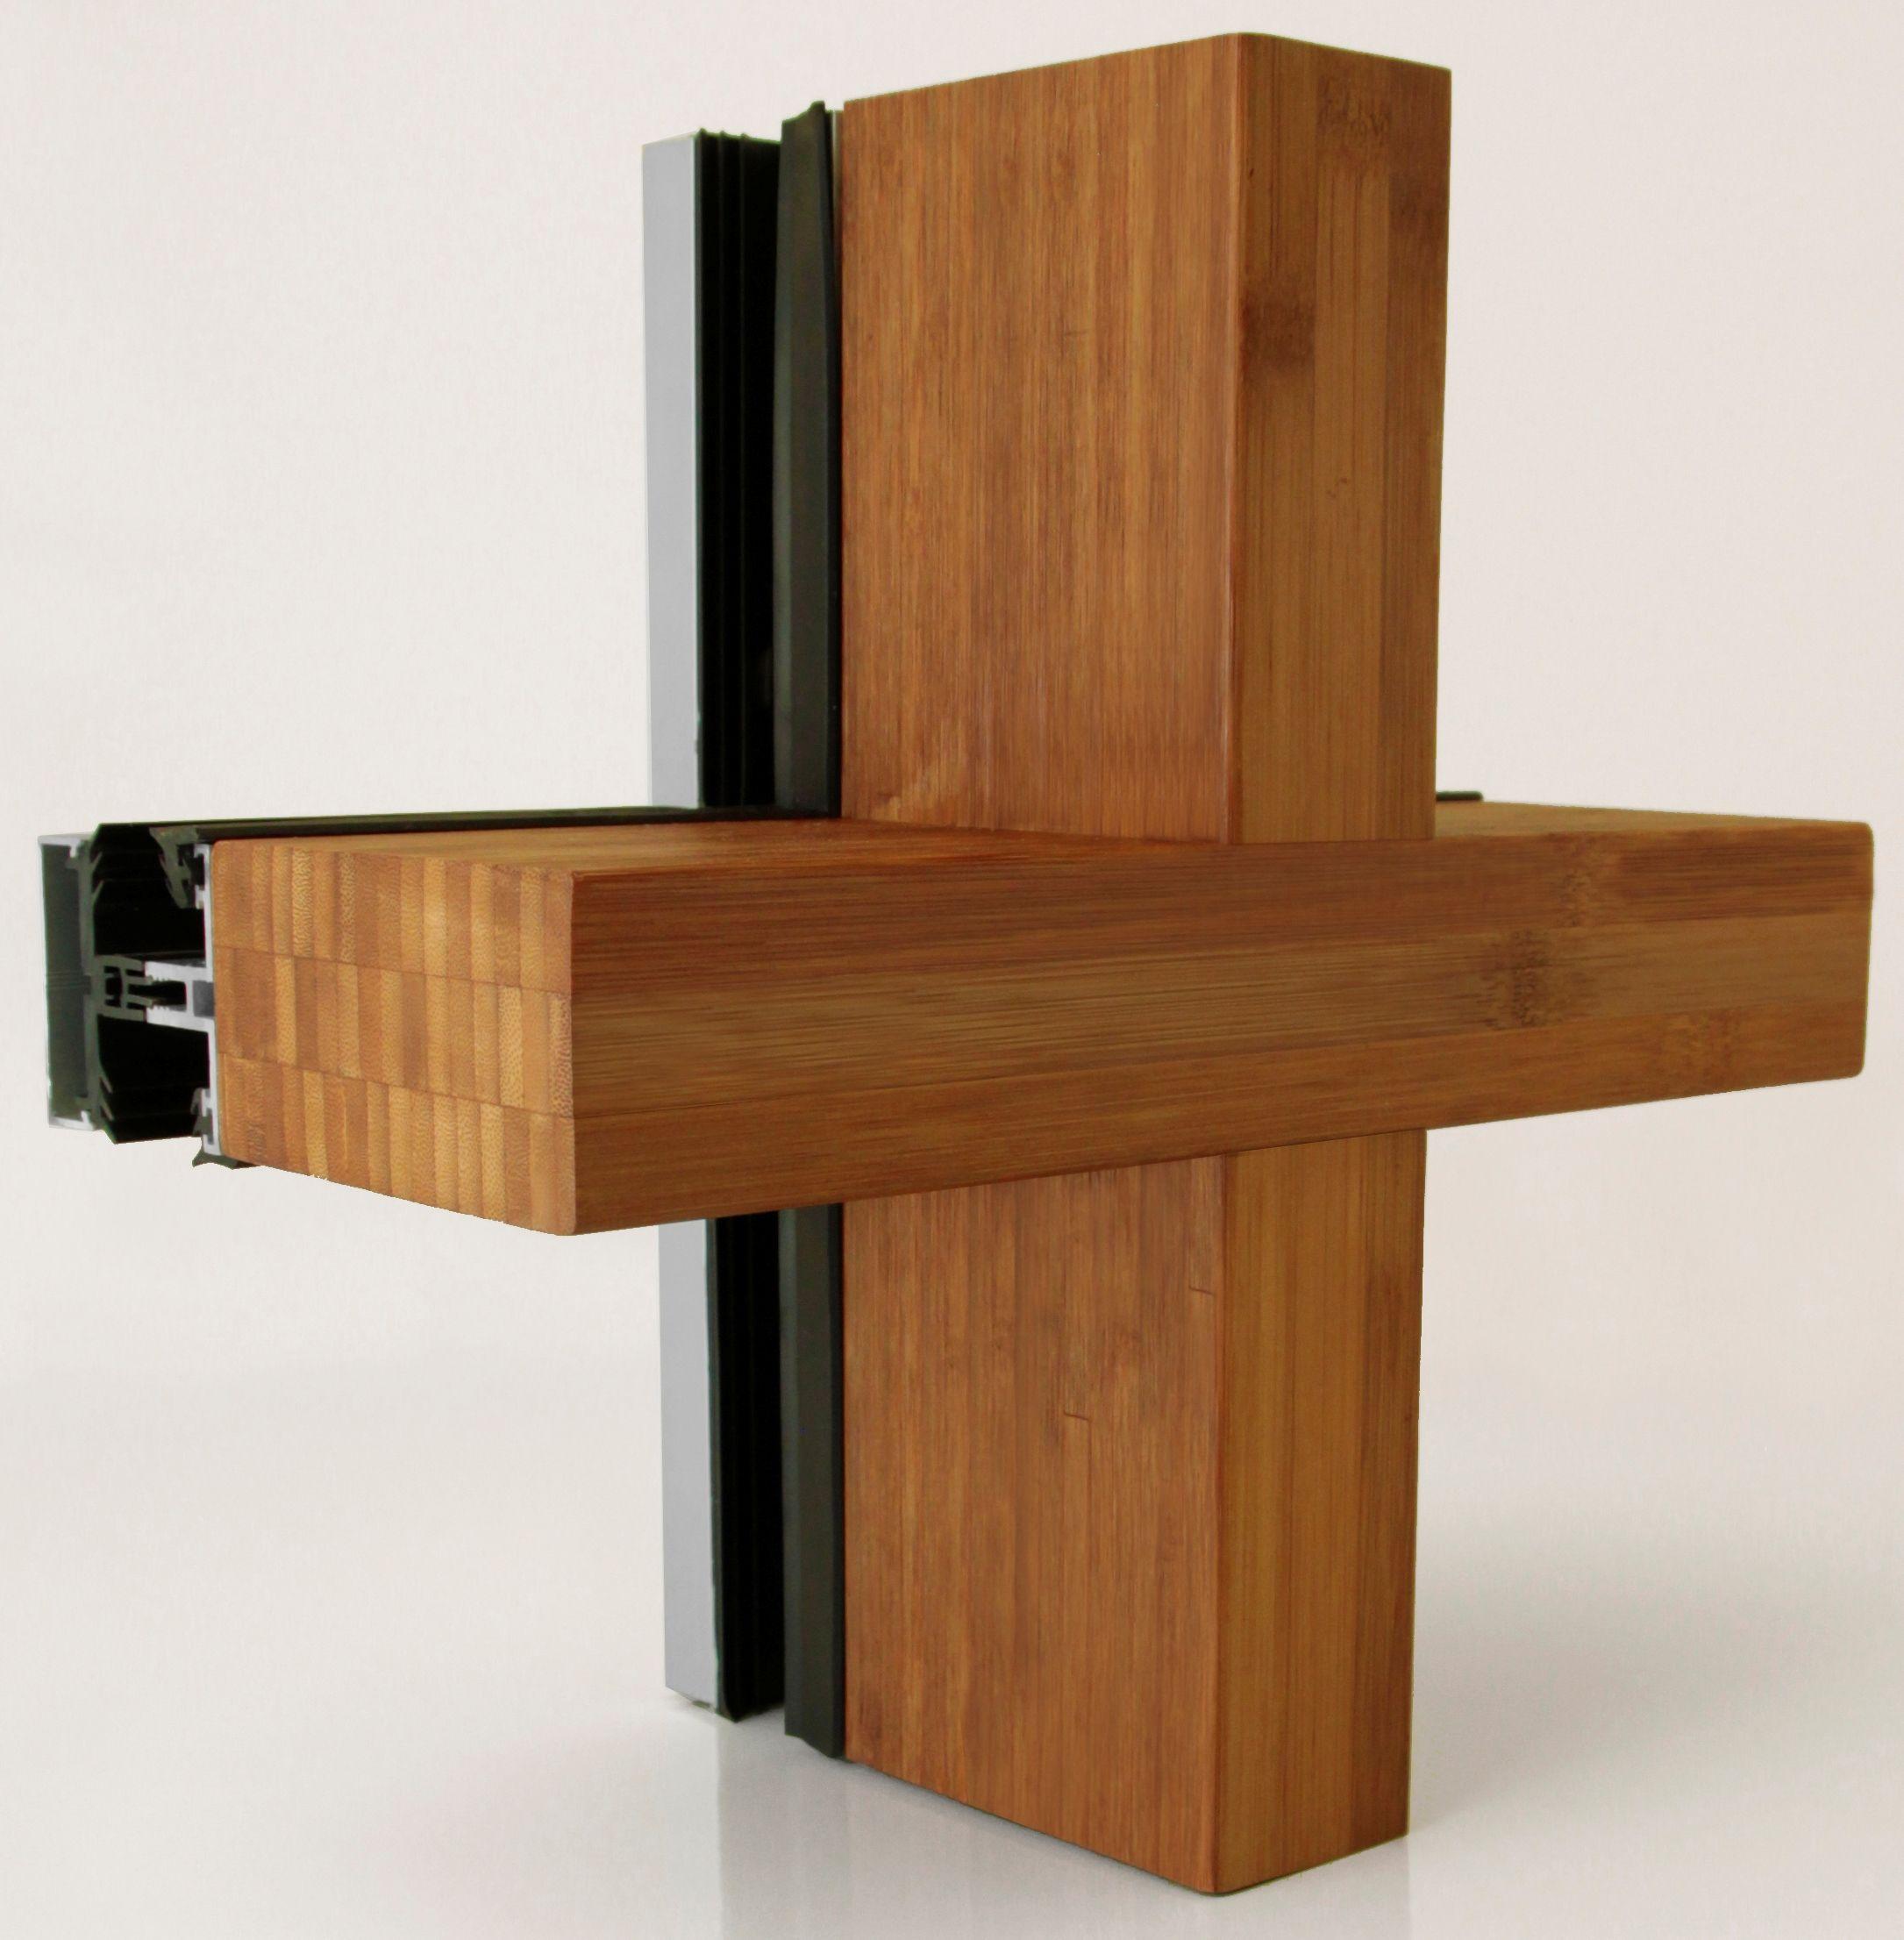 Wood Mullions For Windows : Wood mullion curtain wall menzilperde